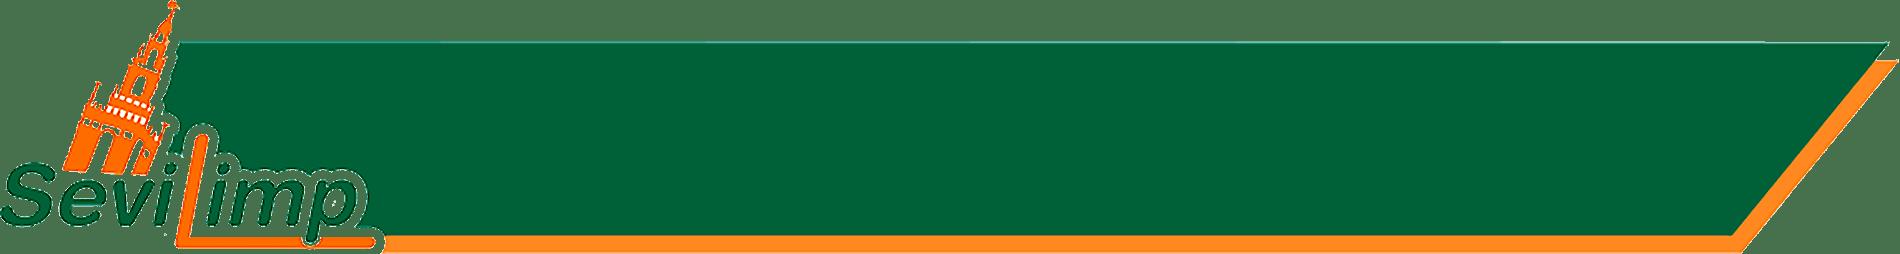 banner-sevilimp-min